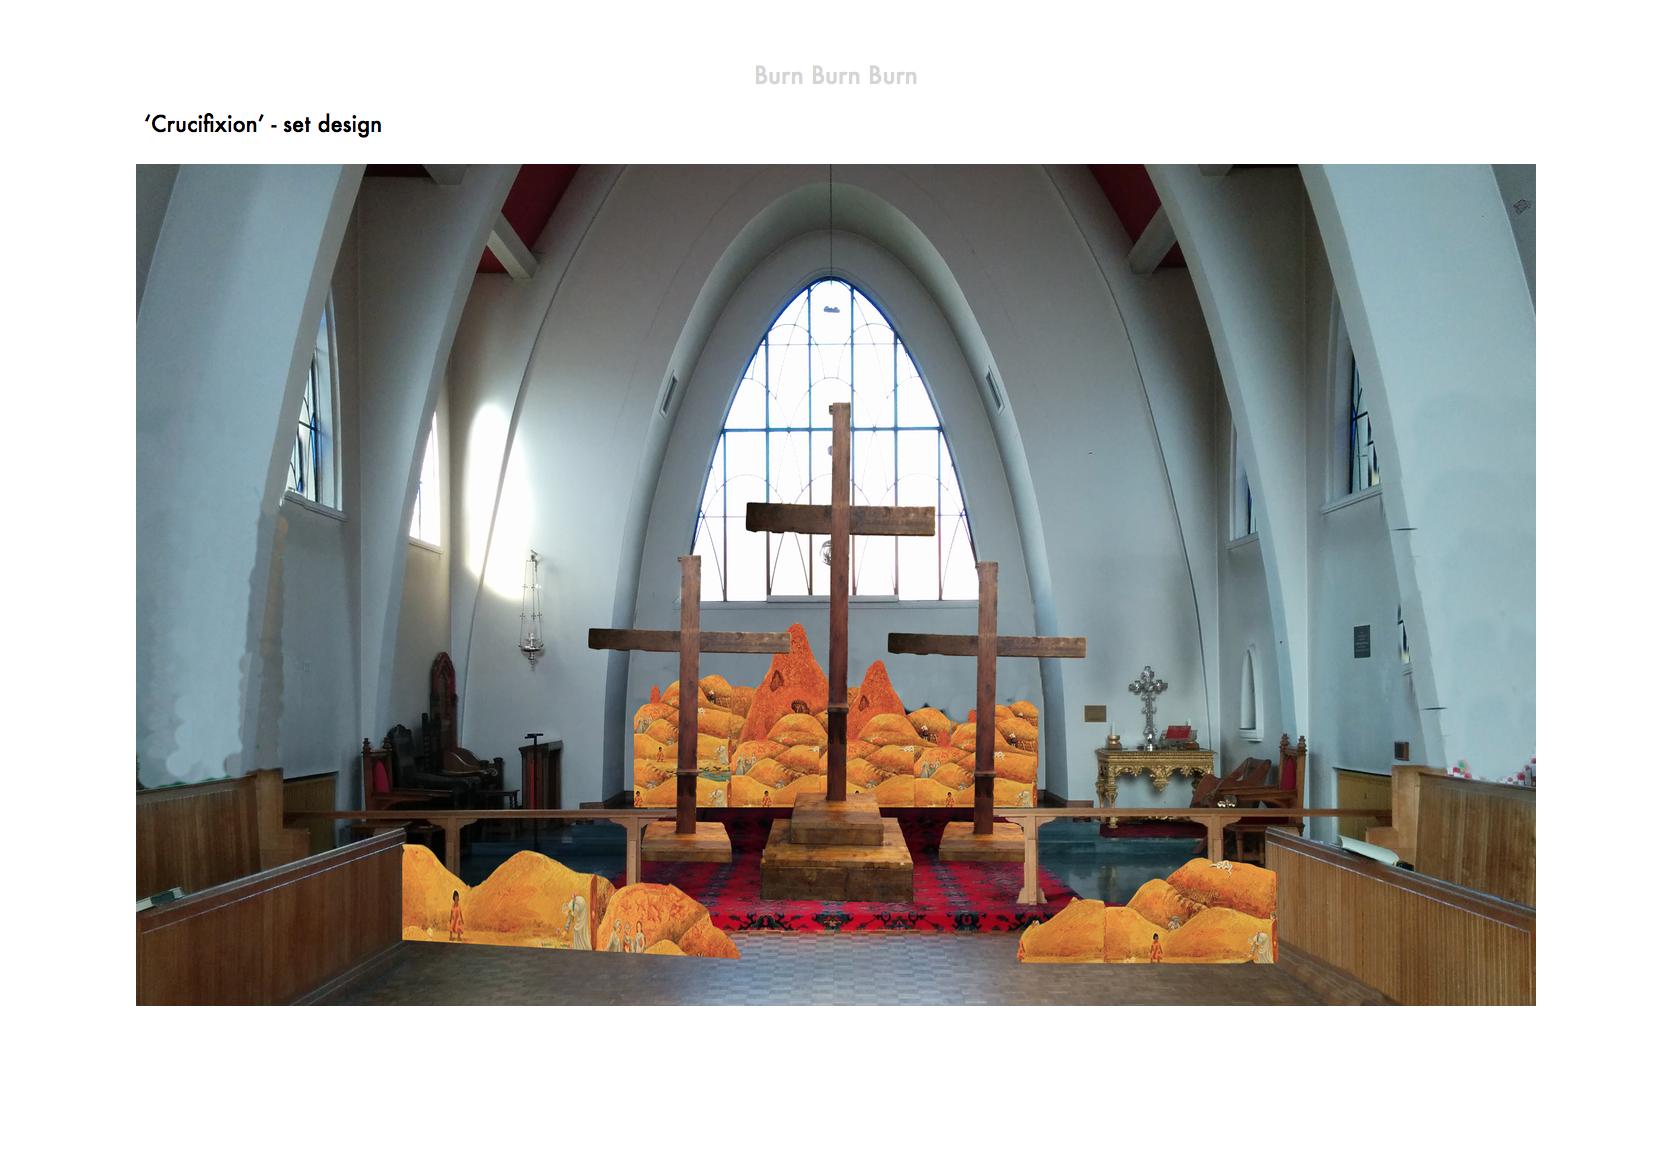 Burn Burn Burn - Crucifixion - Set design